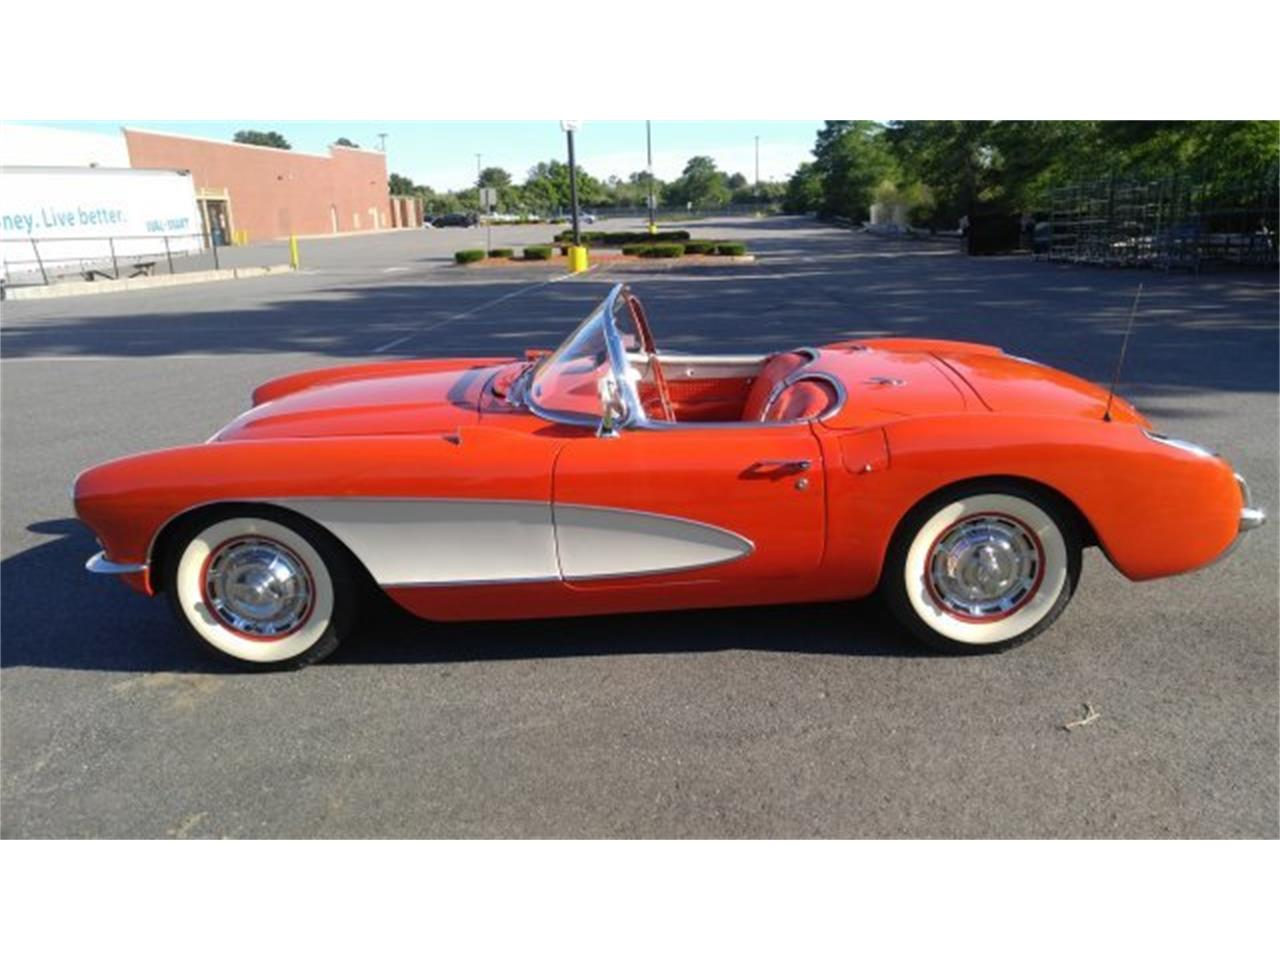 Large Picture of Classic 1956 Chevrolet Corvette located in Massachusetts - $59,500.00 - K3QK